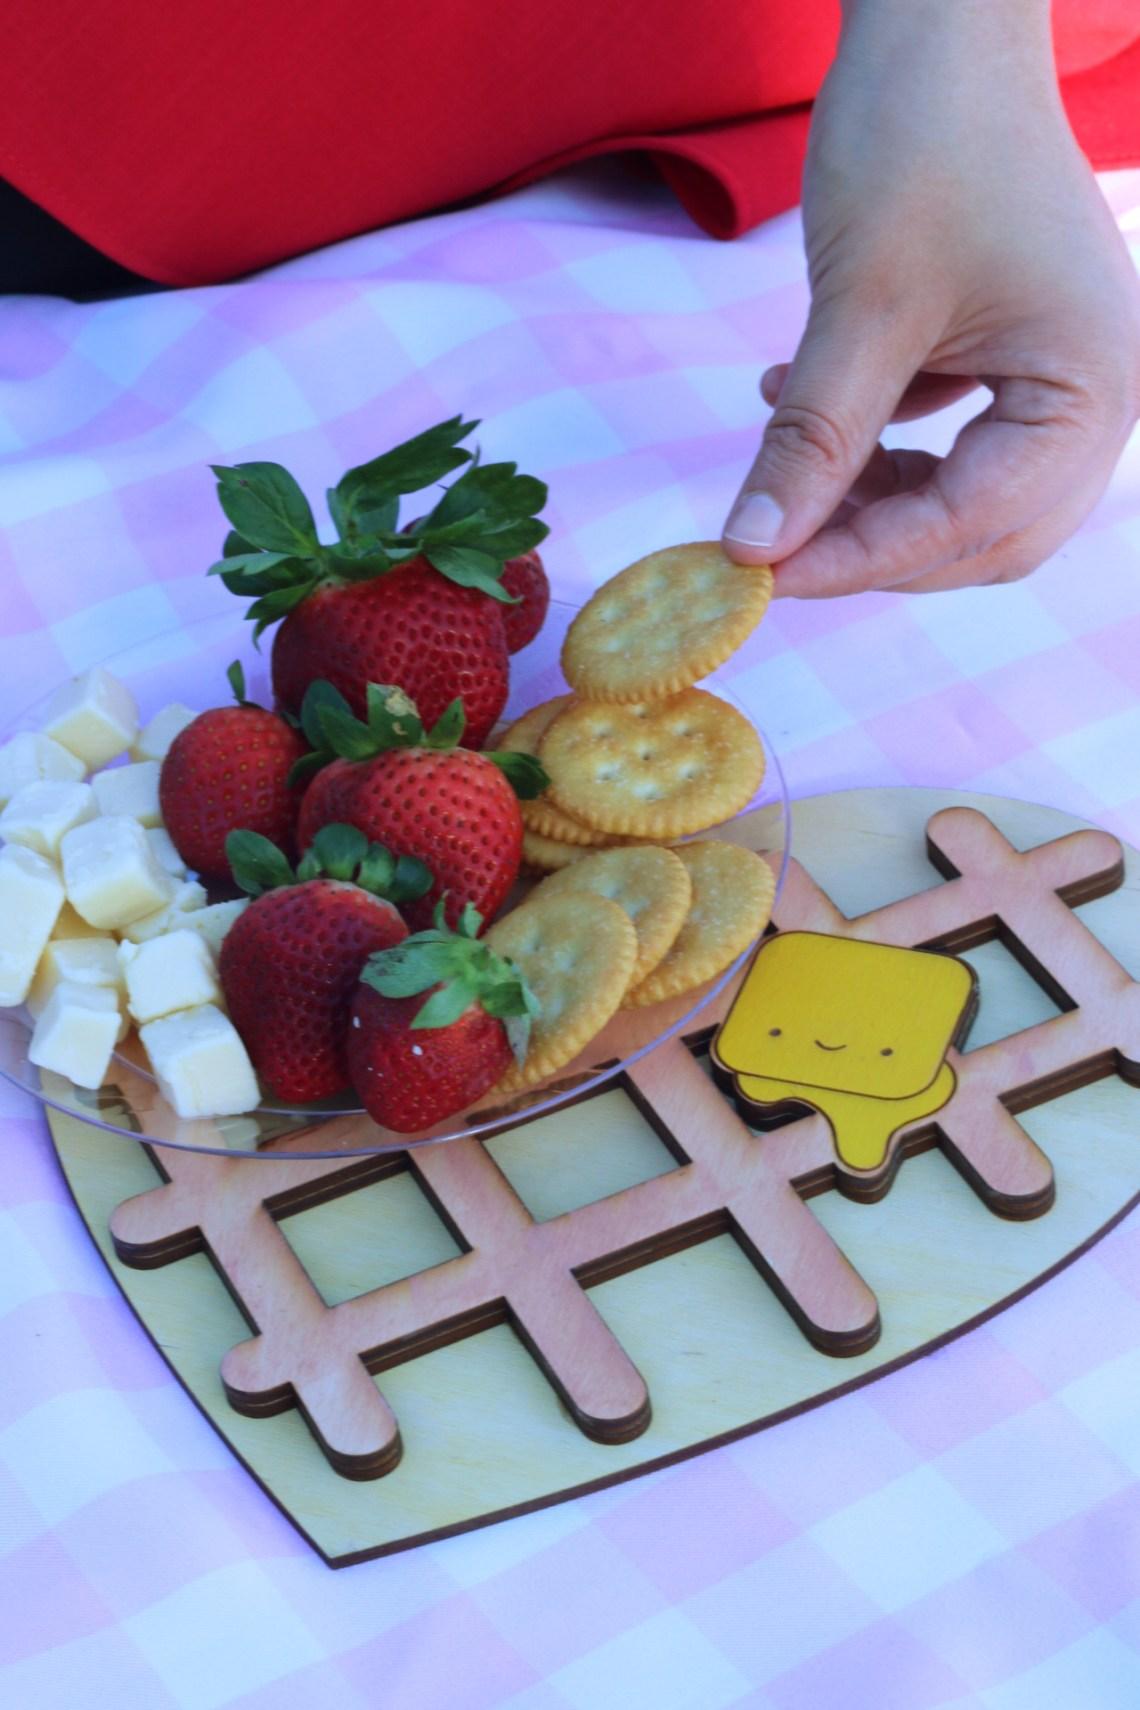 Why you need a trivet at a picnic. Cute Heart Shaped Waffle Trivet. Kawaii.